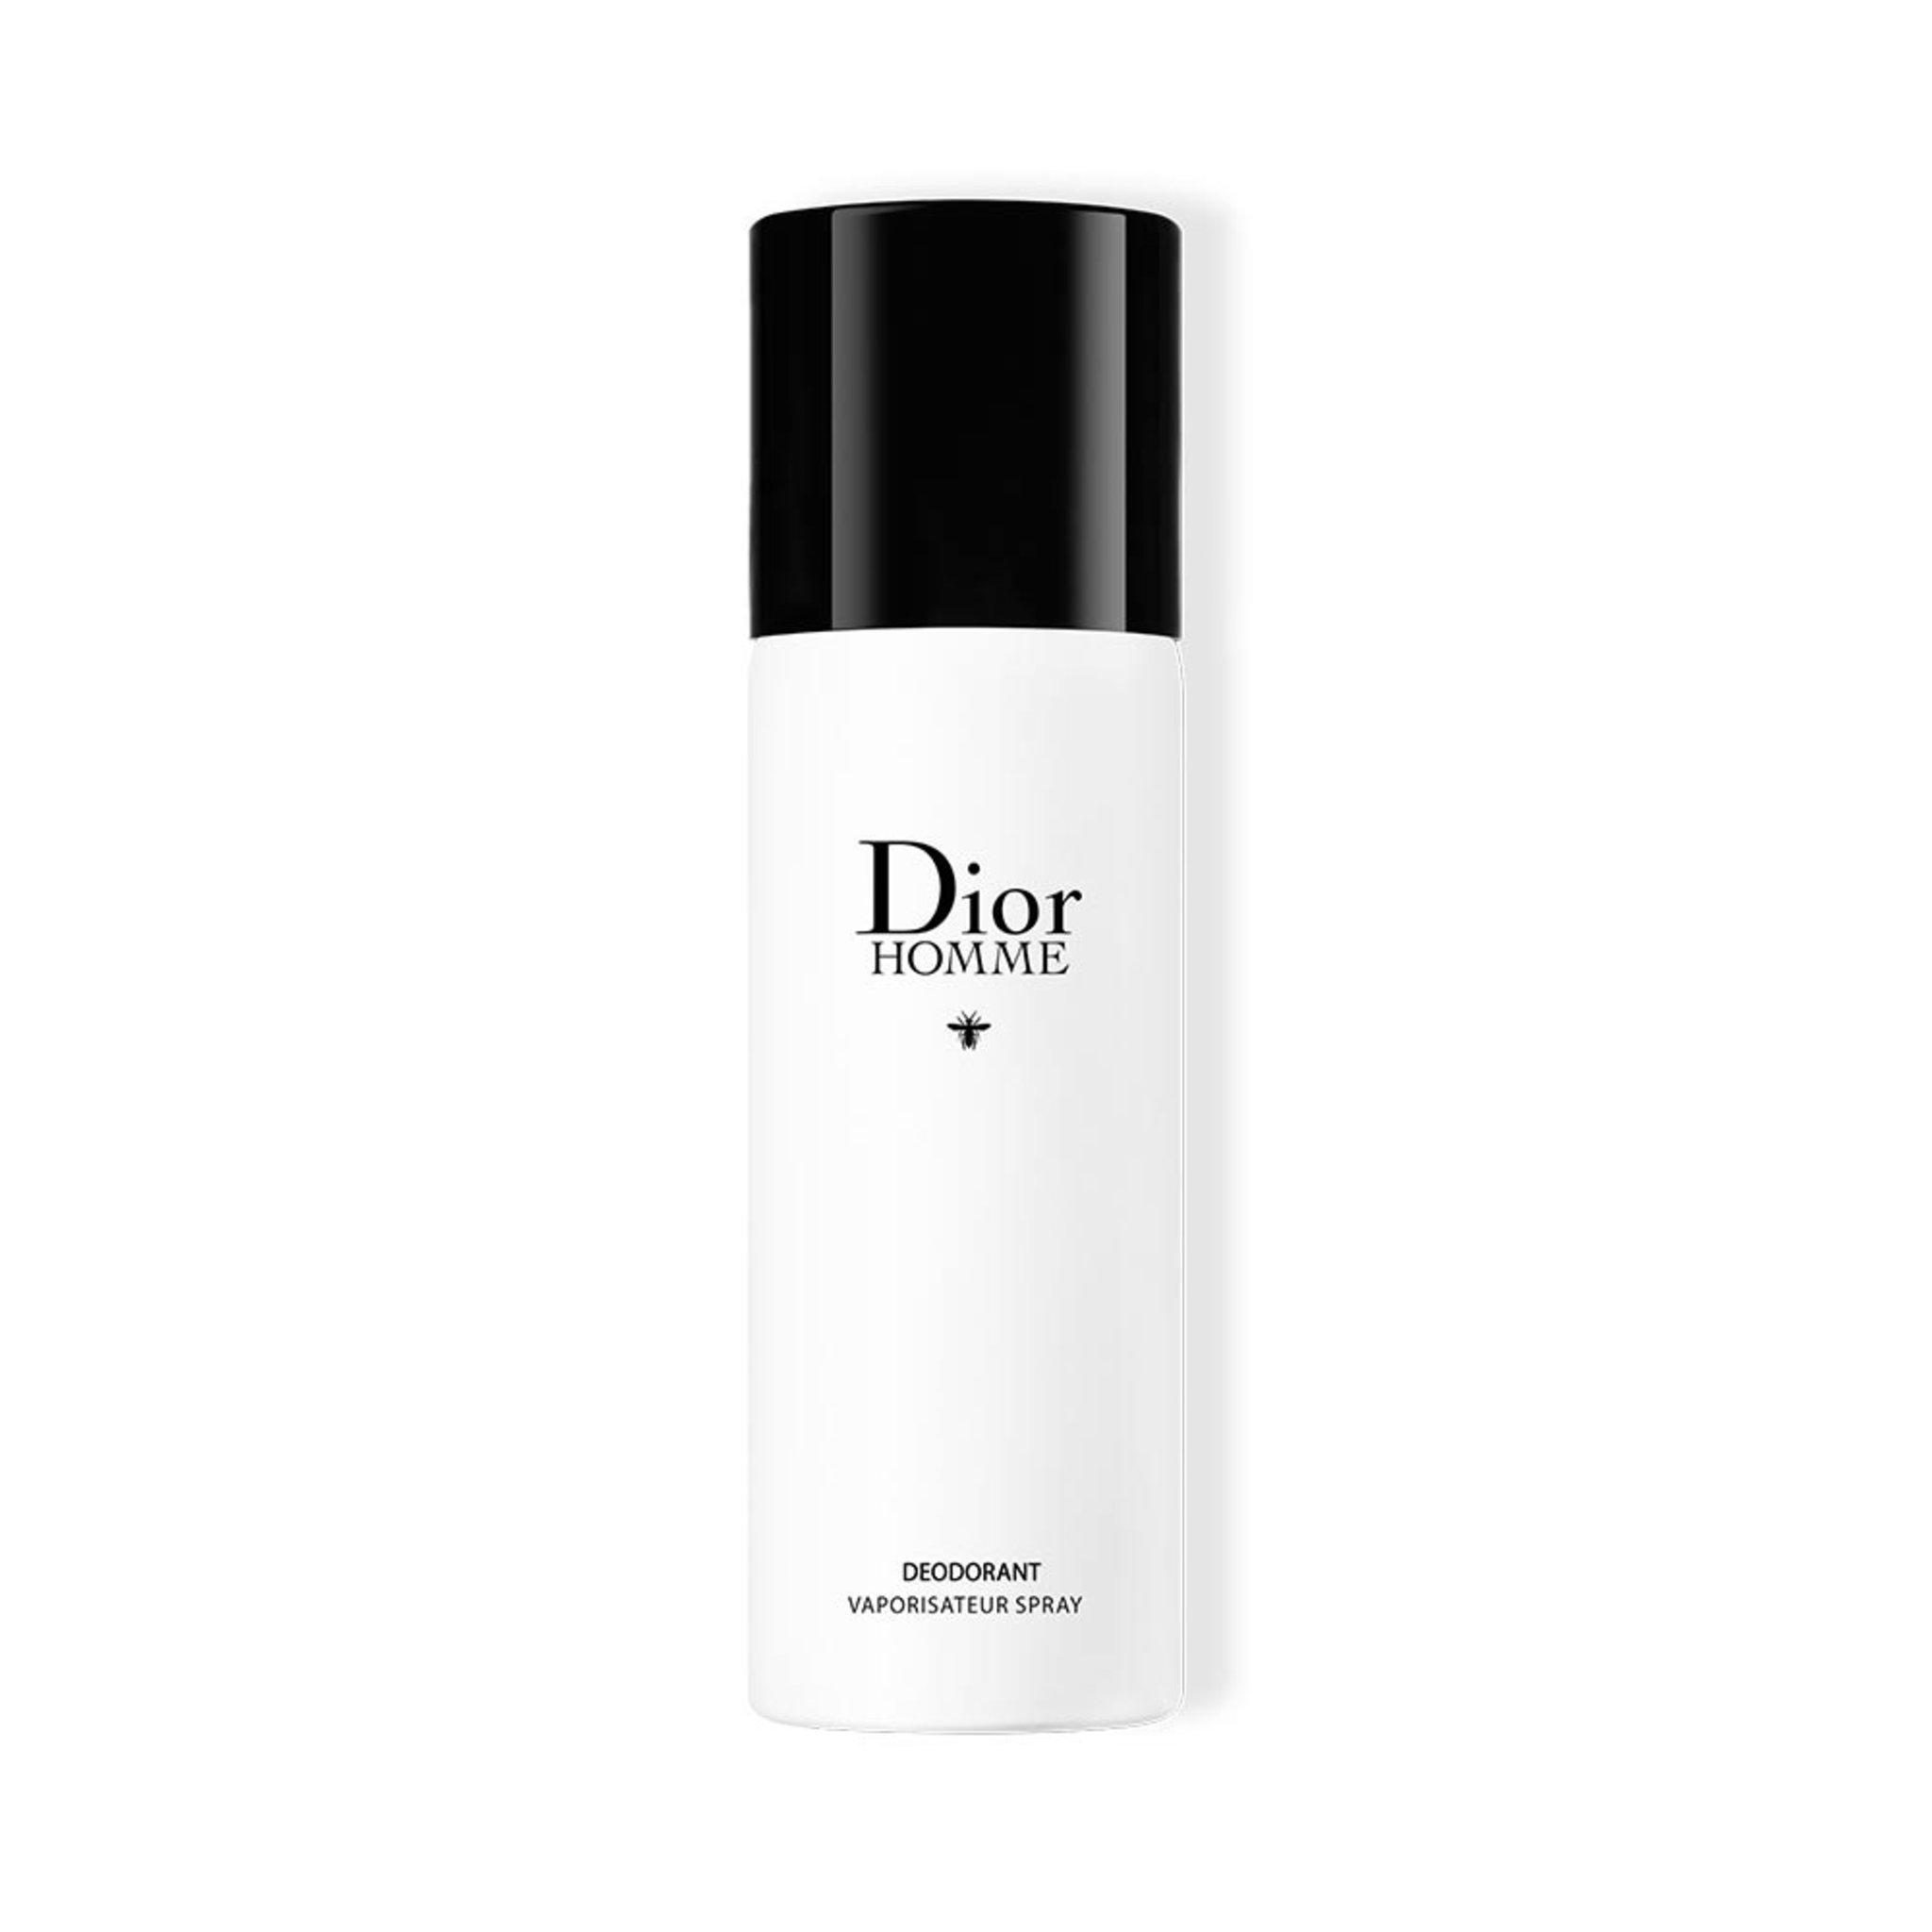 Spray Deodorant, 150 ML